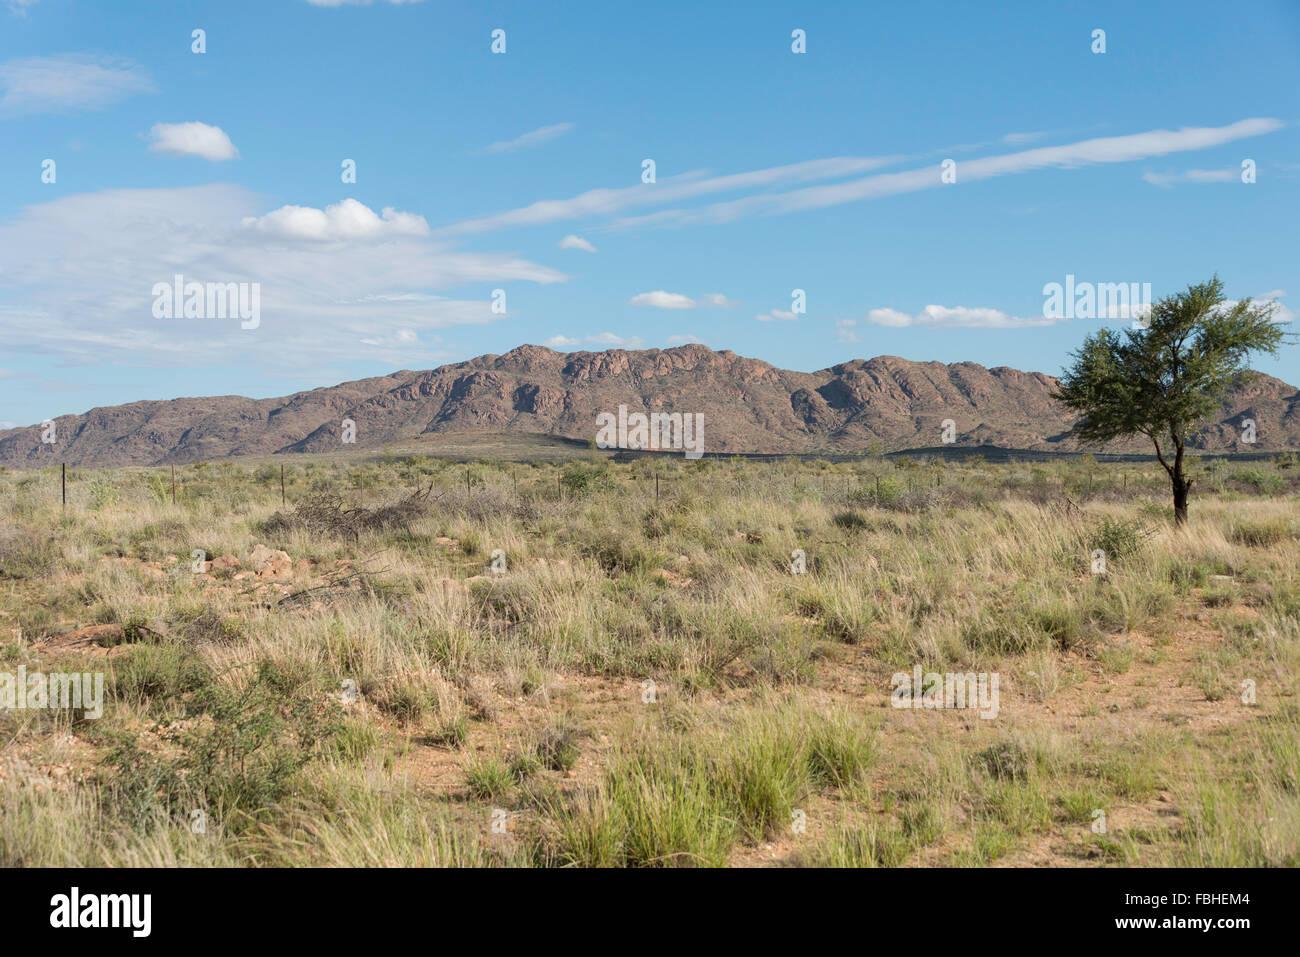 Namib Naukluft Park, Solitaire, Désert du Namib, Namibie Photo Stock